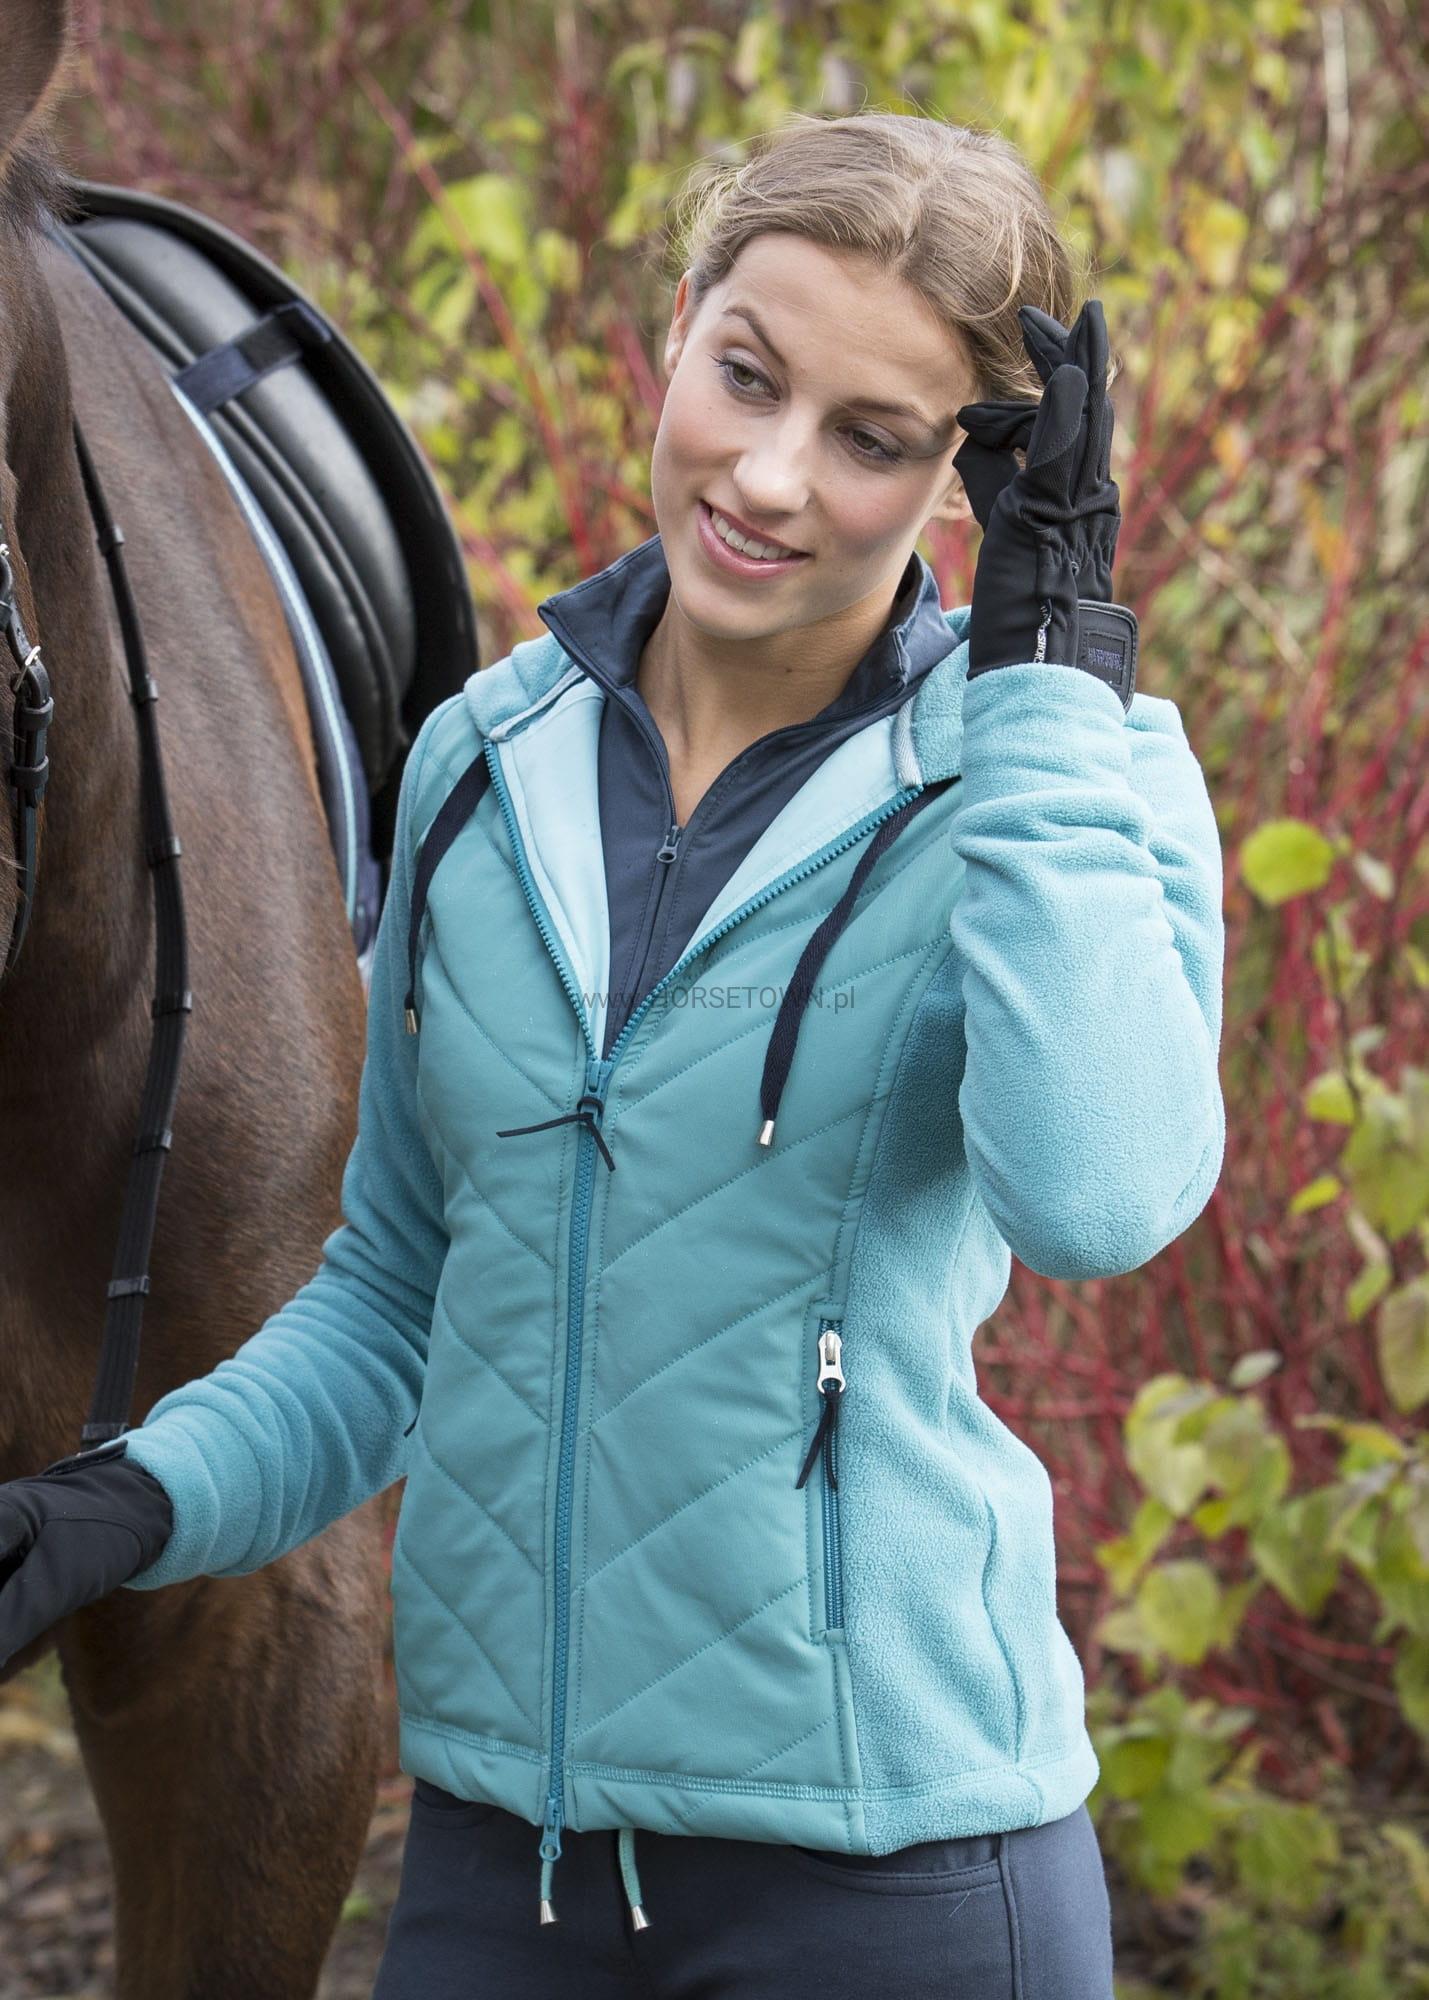 6208008cada7d Harry's Horse ciepła bluza Filton Teal HORSETOWN Sklep Jeździecki